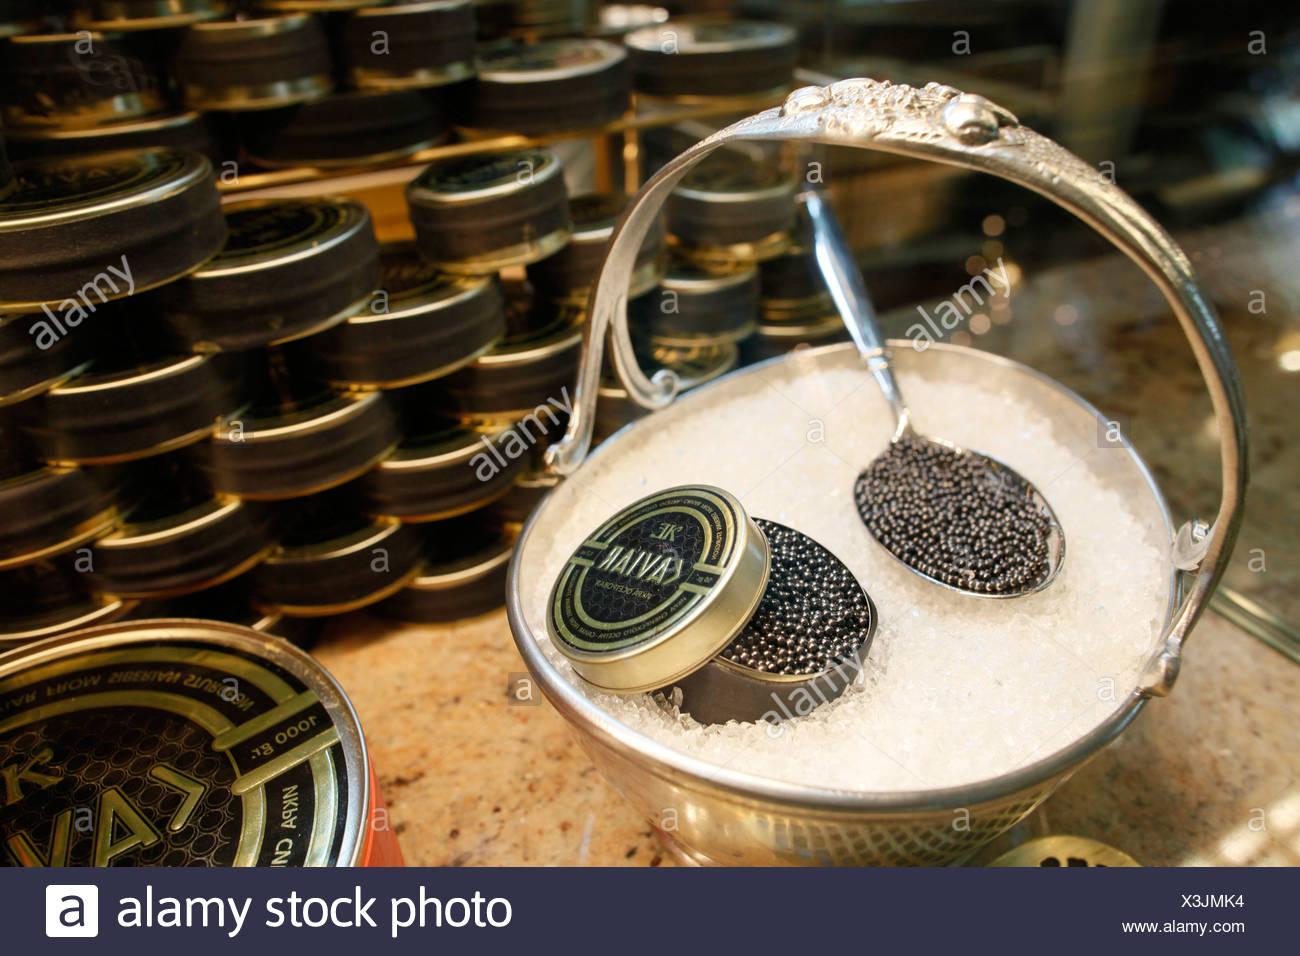 Russian caviar. Saint Petersburg. Russia. - Stock Image